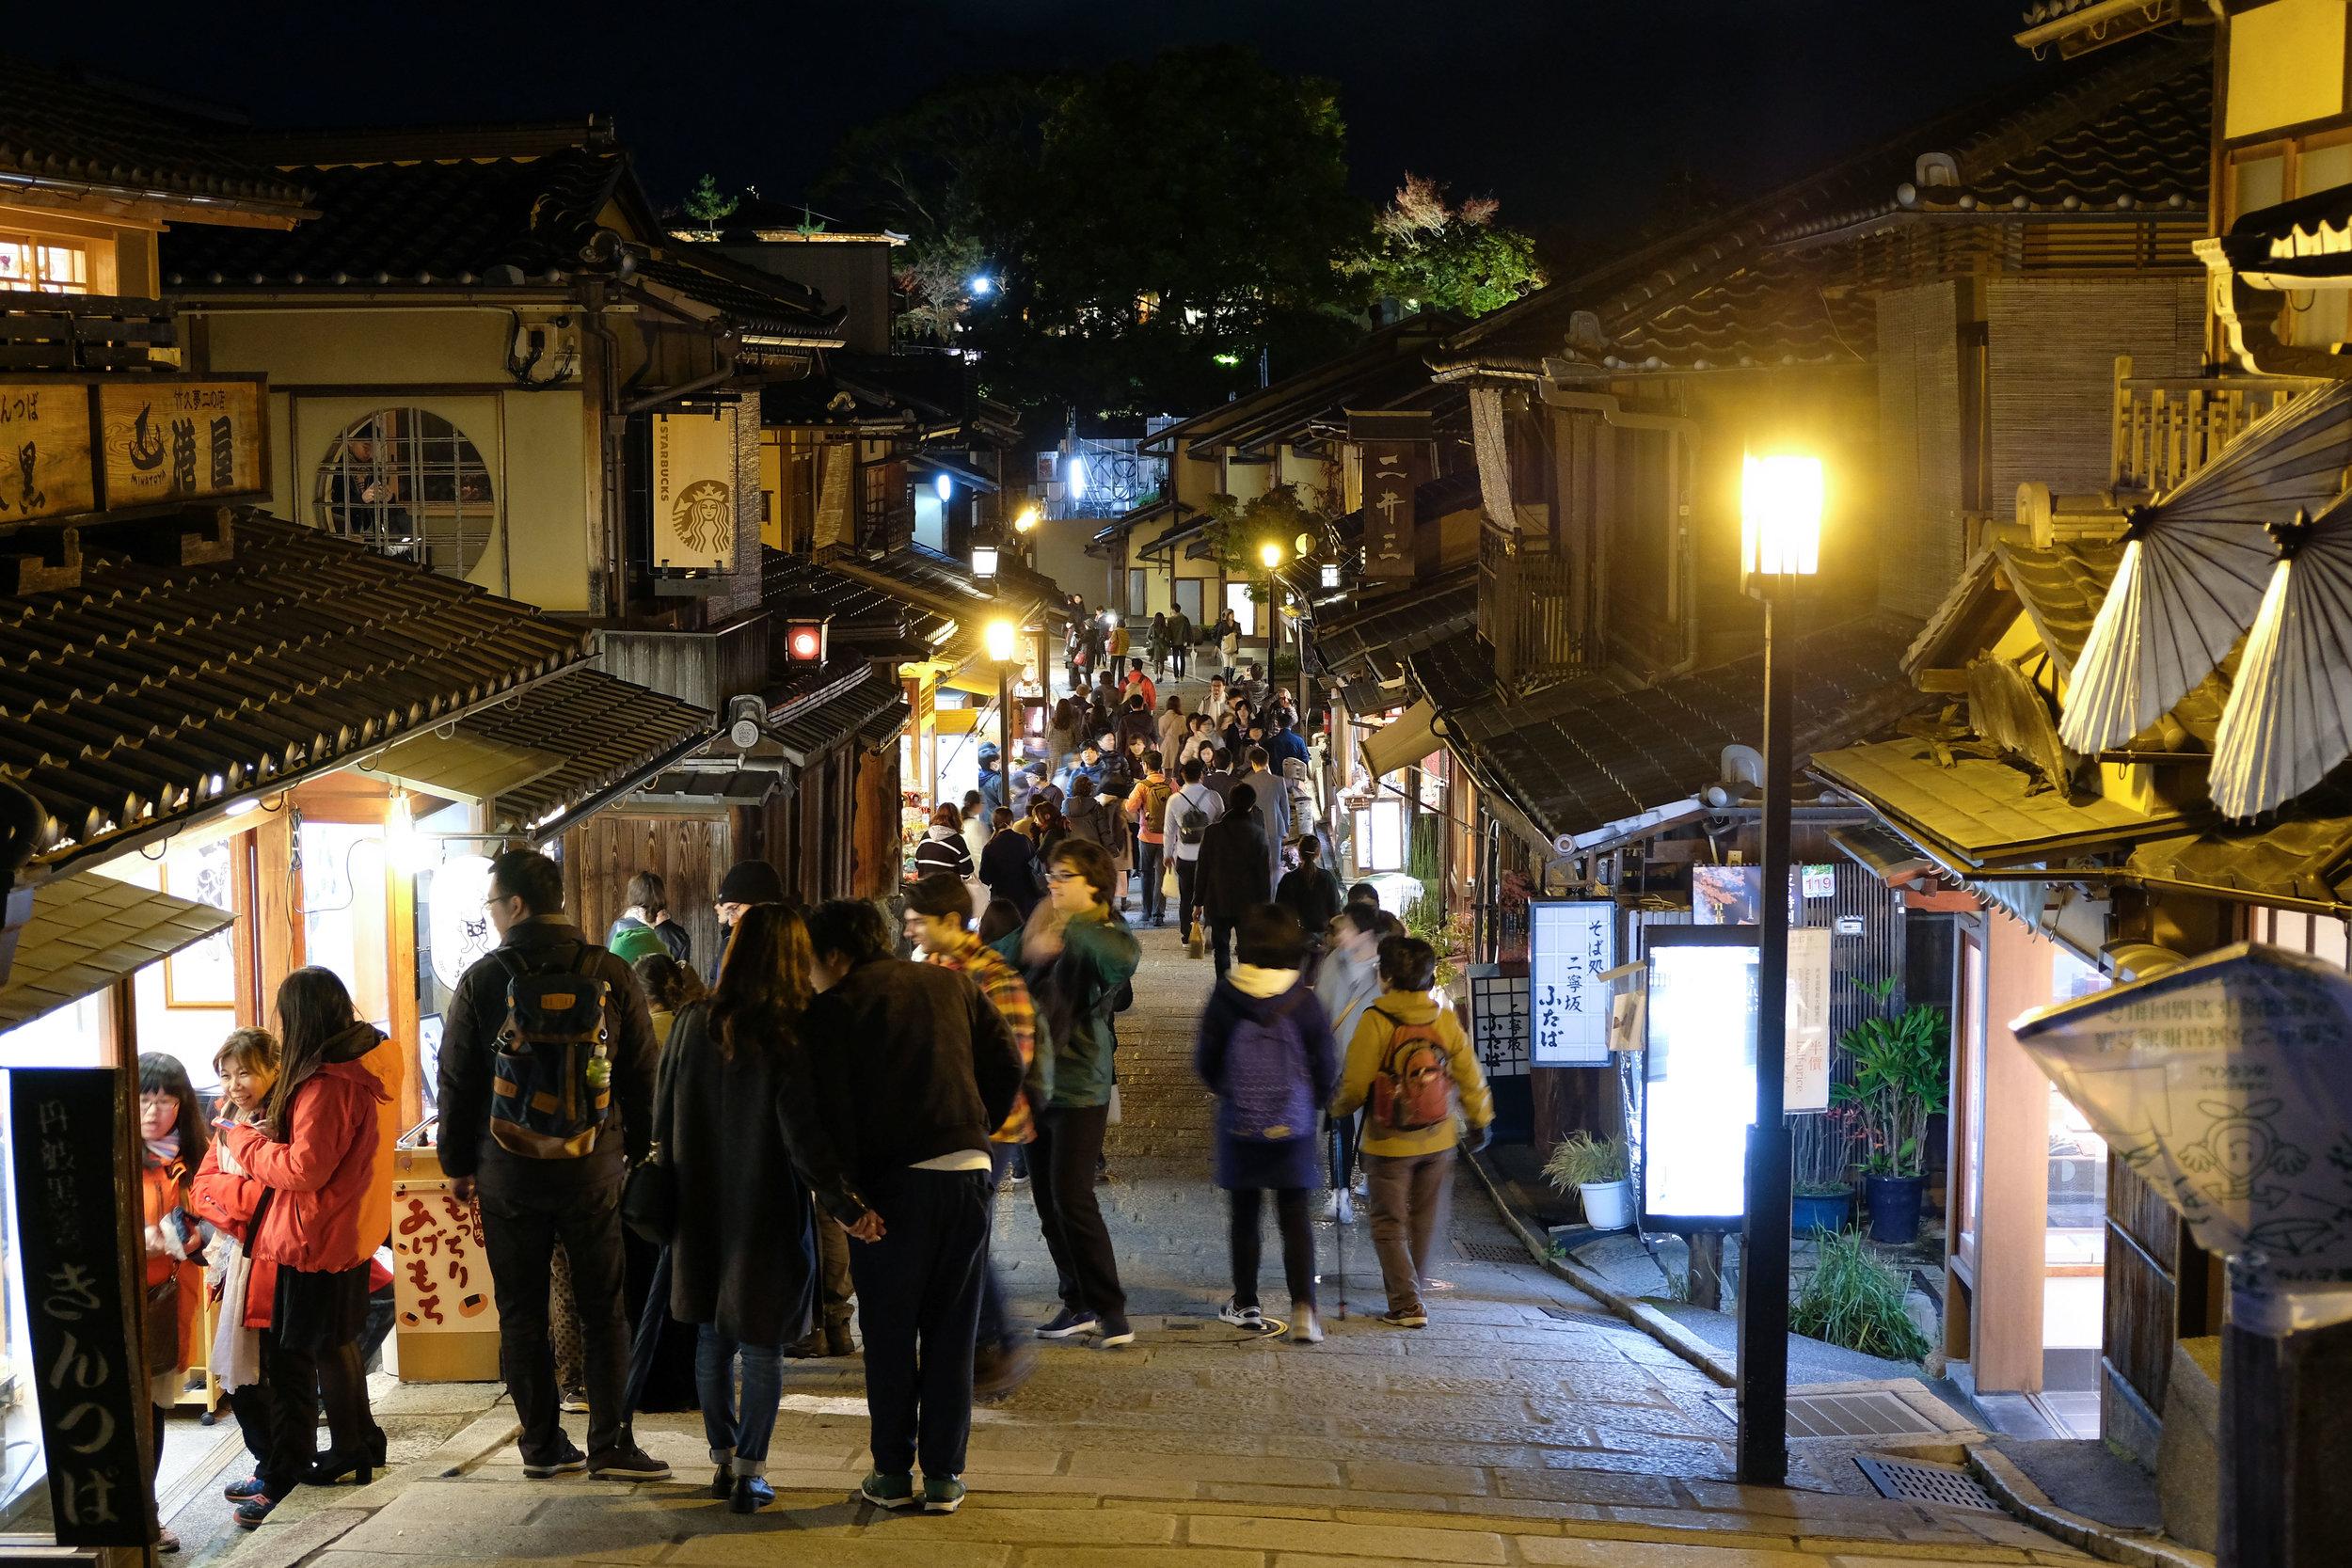 japan week 7: Photo Shoots, Face Masks, and too many temples - November 25th, 2017